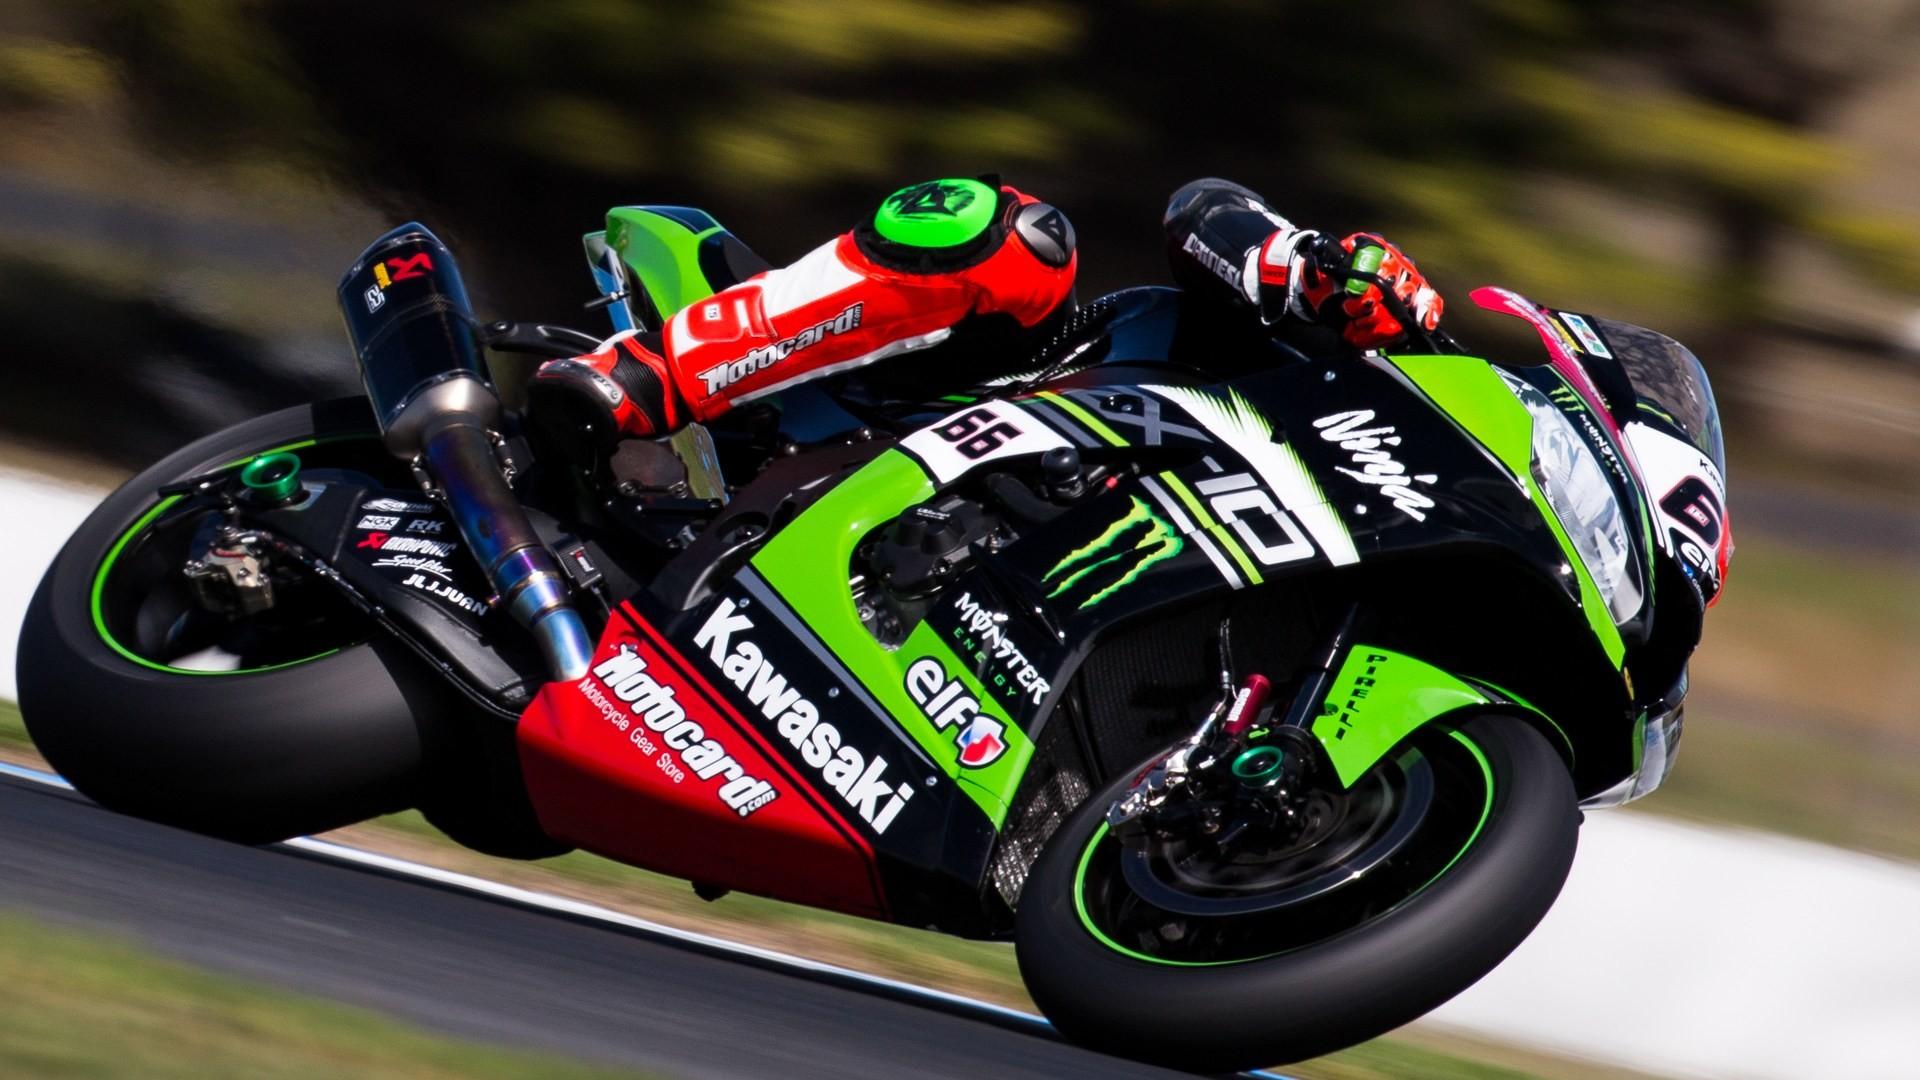 World Superbike Wallpaper (73+ images)